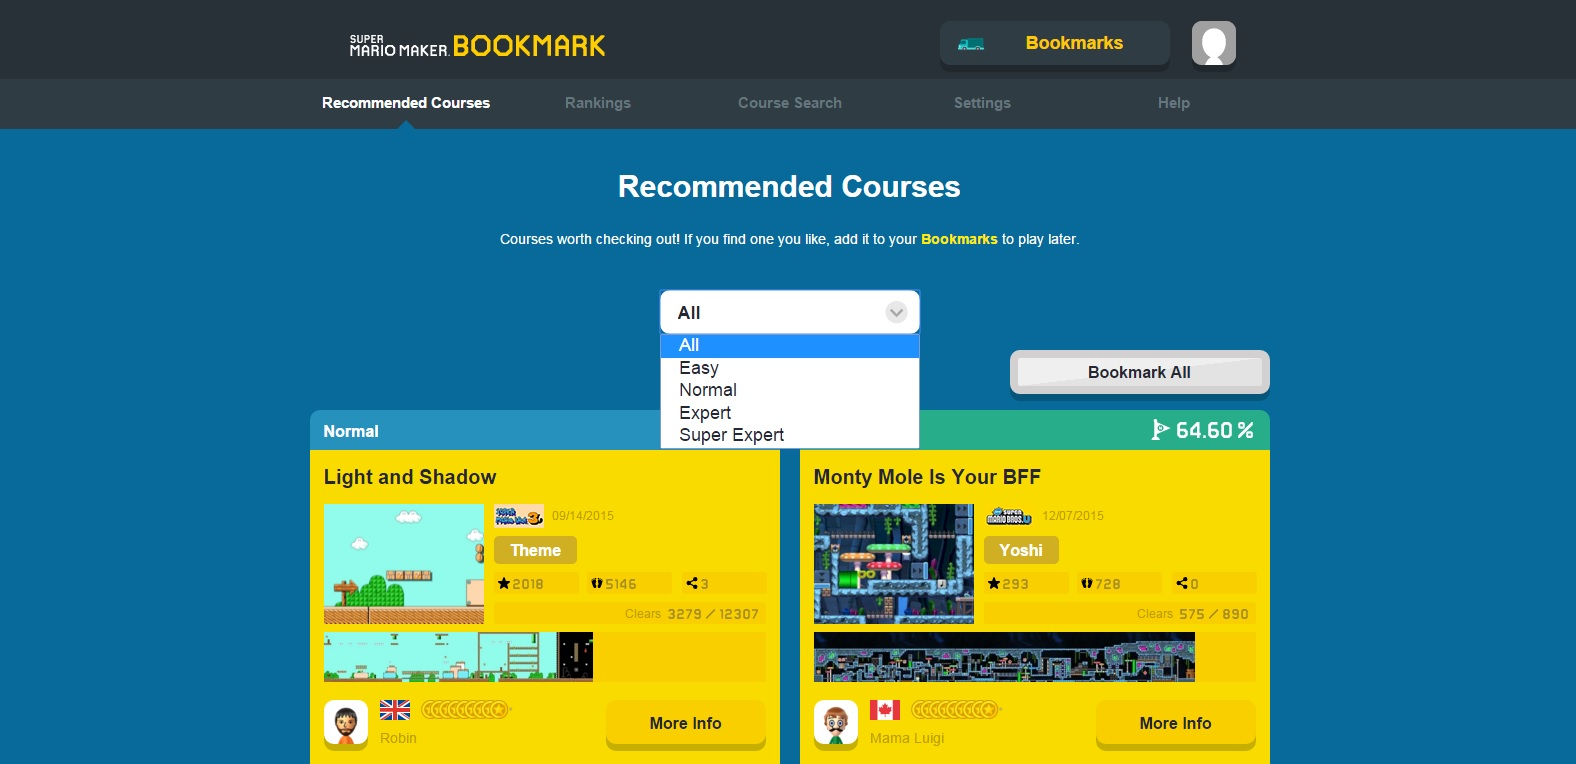 Super Mario Maker Bookmark site now lets you filter levels